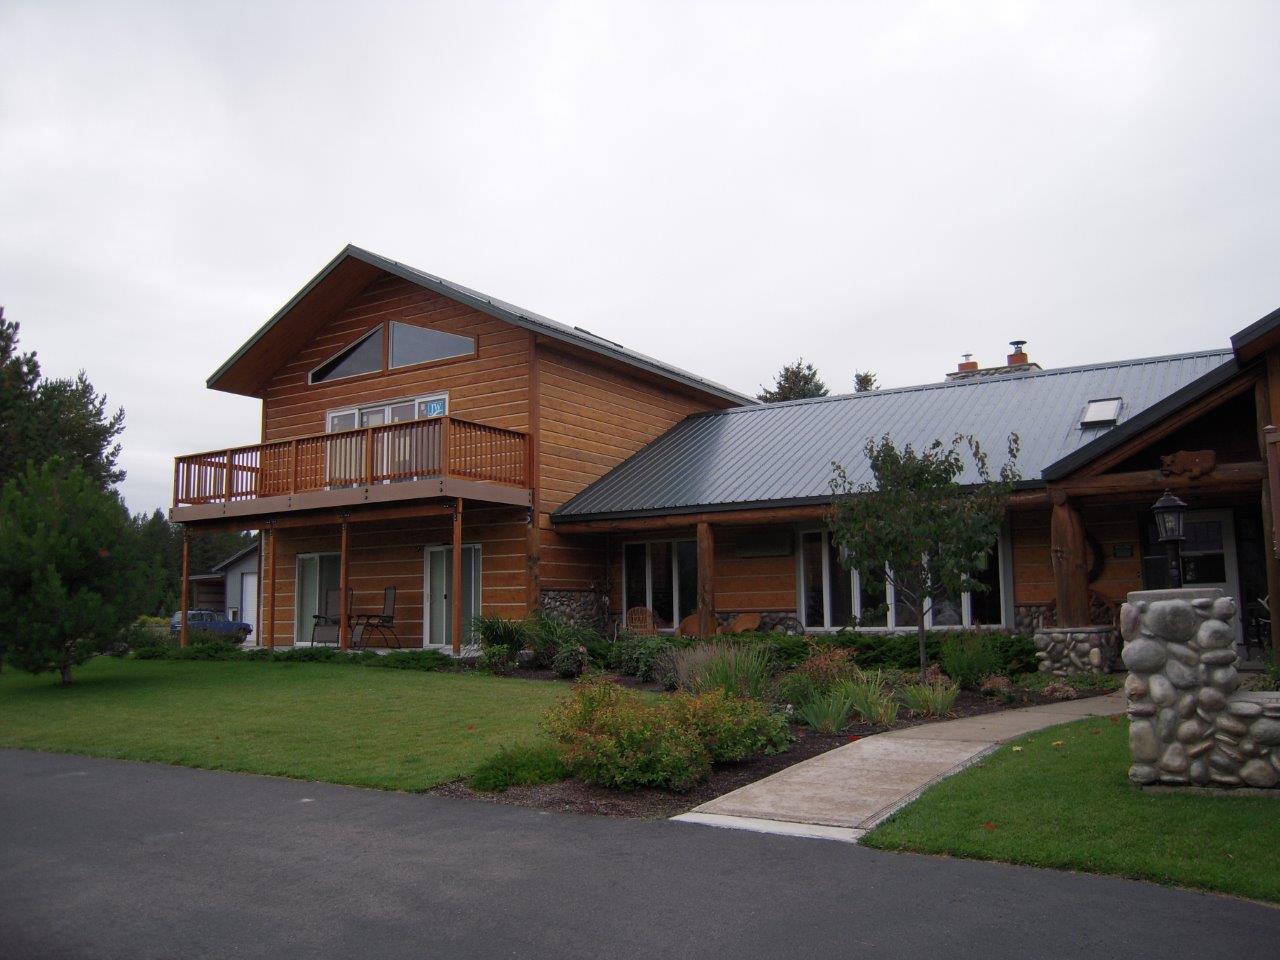 Additional photo for property listing at Badrock B&B 480  Badrock Dr Columbia Falls, Montana 59912 United States